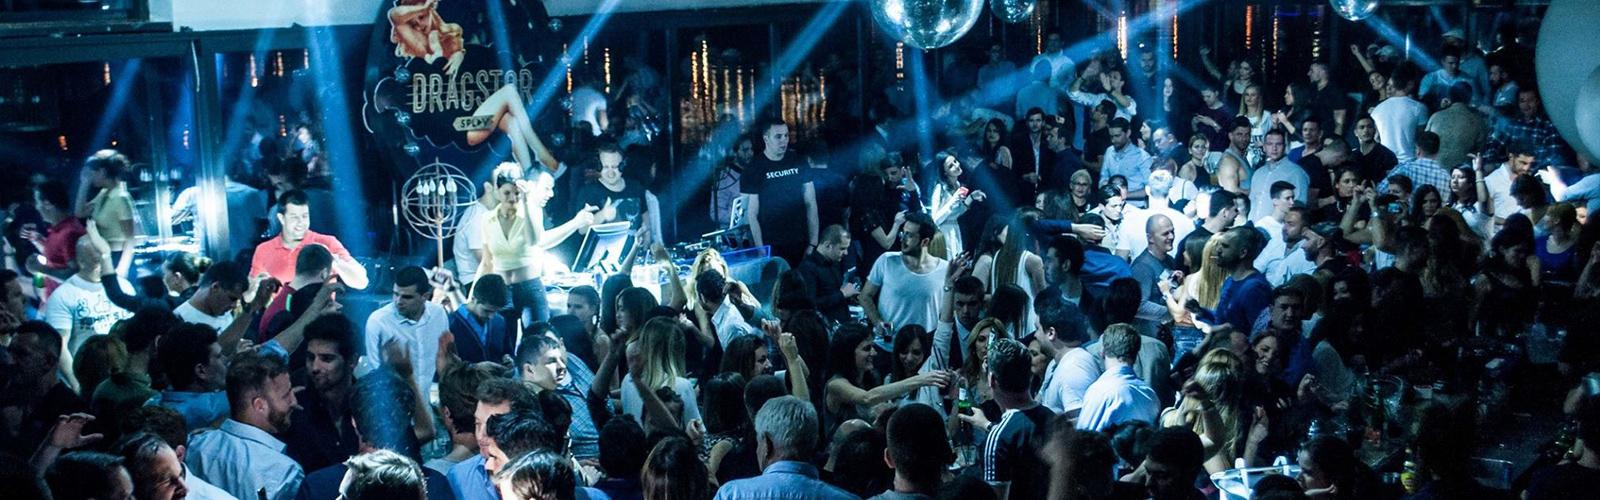 Concierge Belgrade | Noćni klub Dragstor play